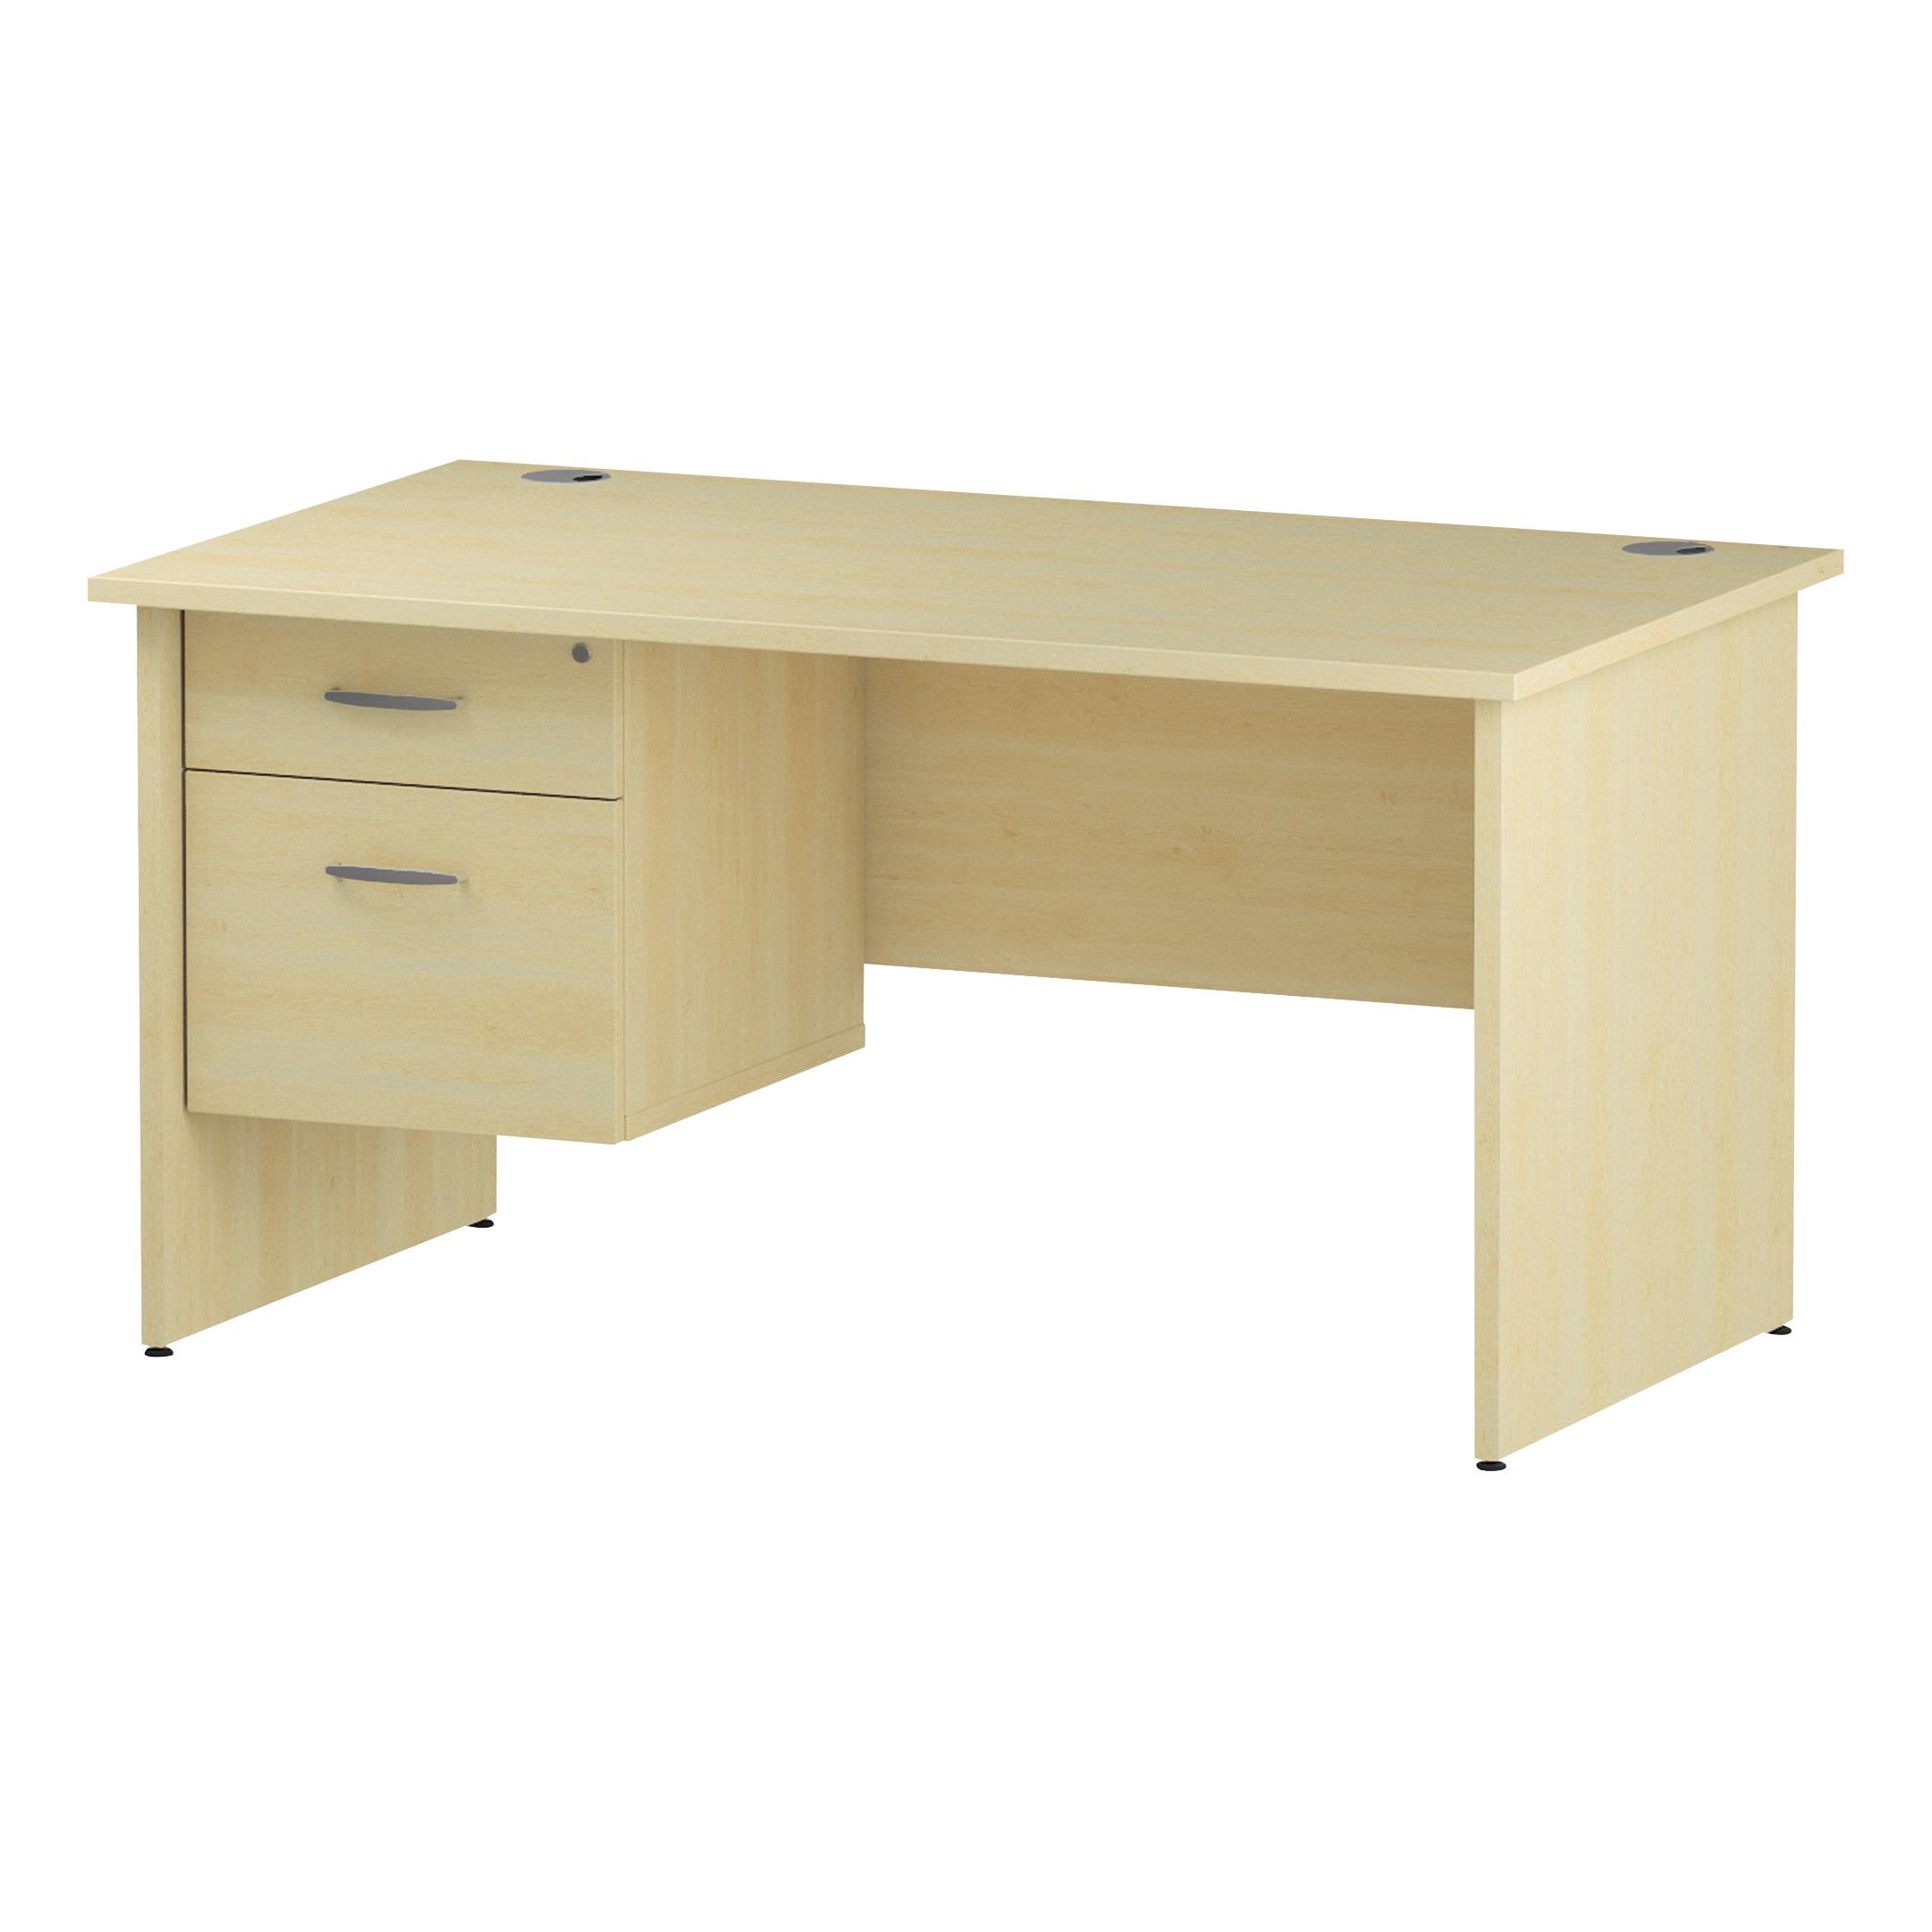 Trexus Rectangular Desk Panel End Leg 1400x800mm Fixed Pedestal 2 Drawers Maple Ref I002477